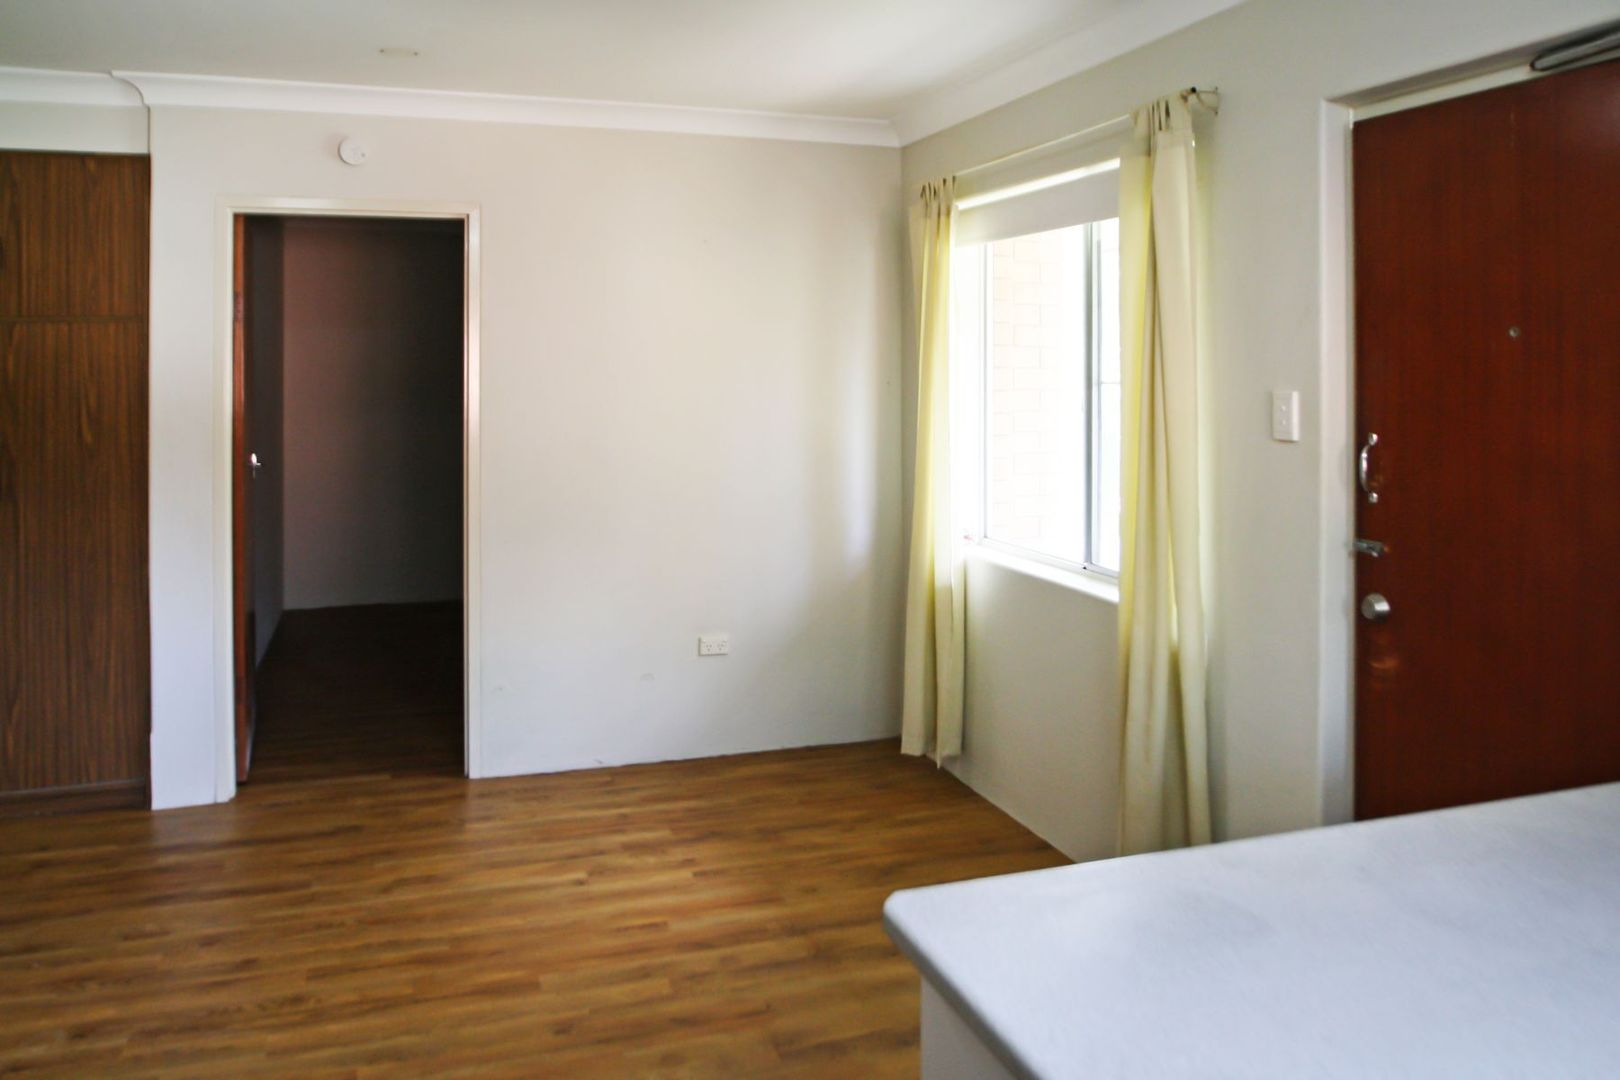 1/25 Skilton Avenue, East Maitland NSW 2323, Image 1